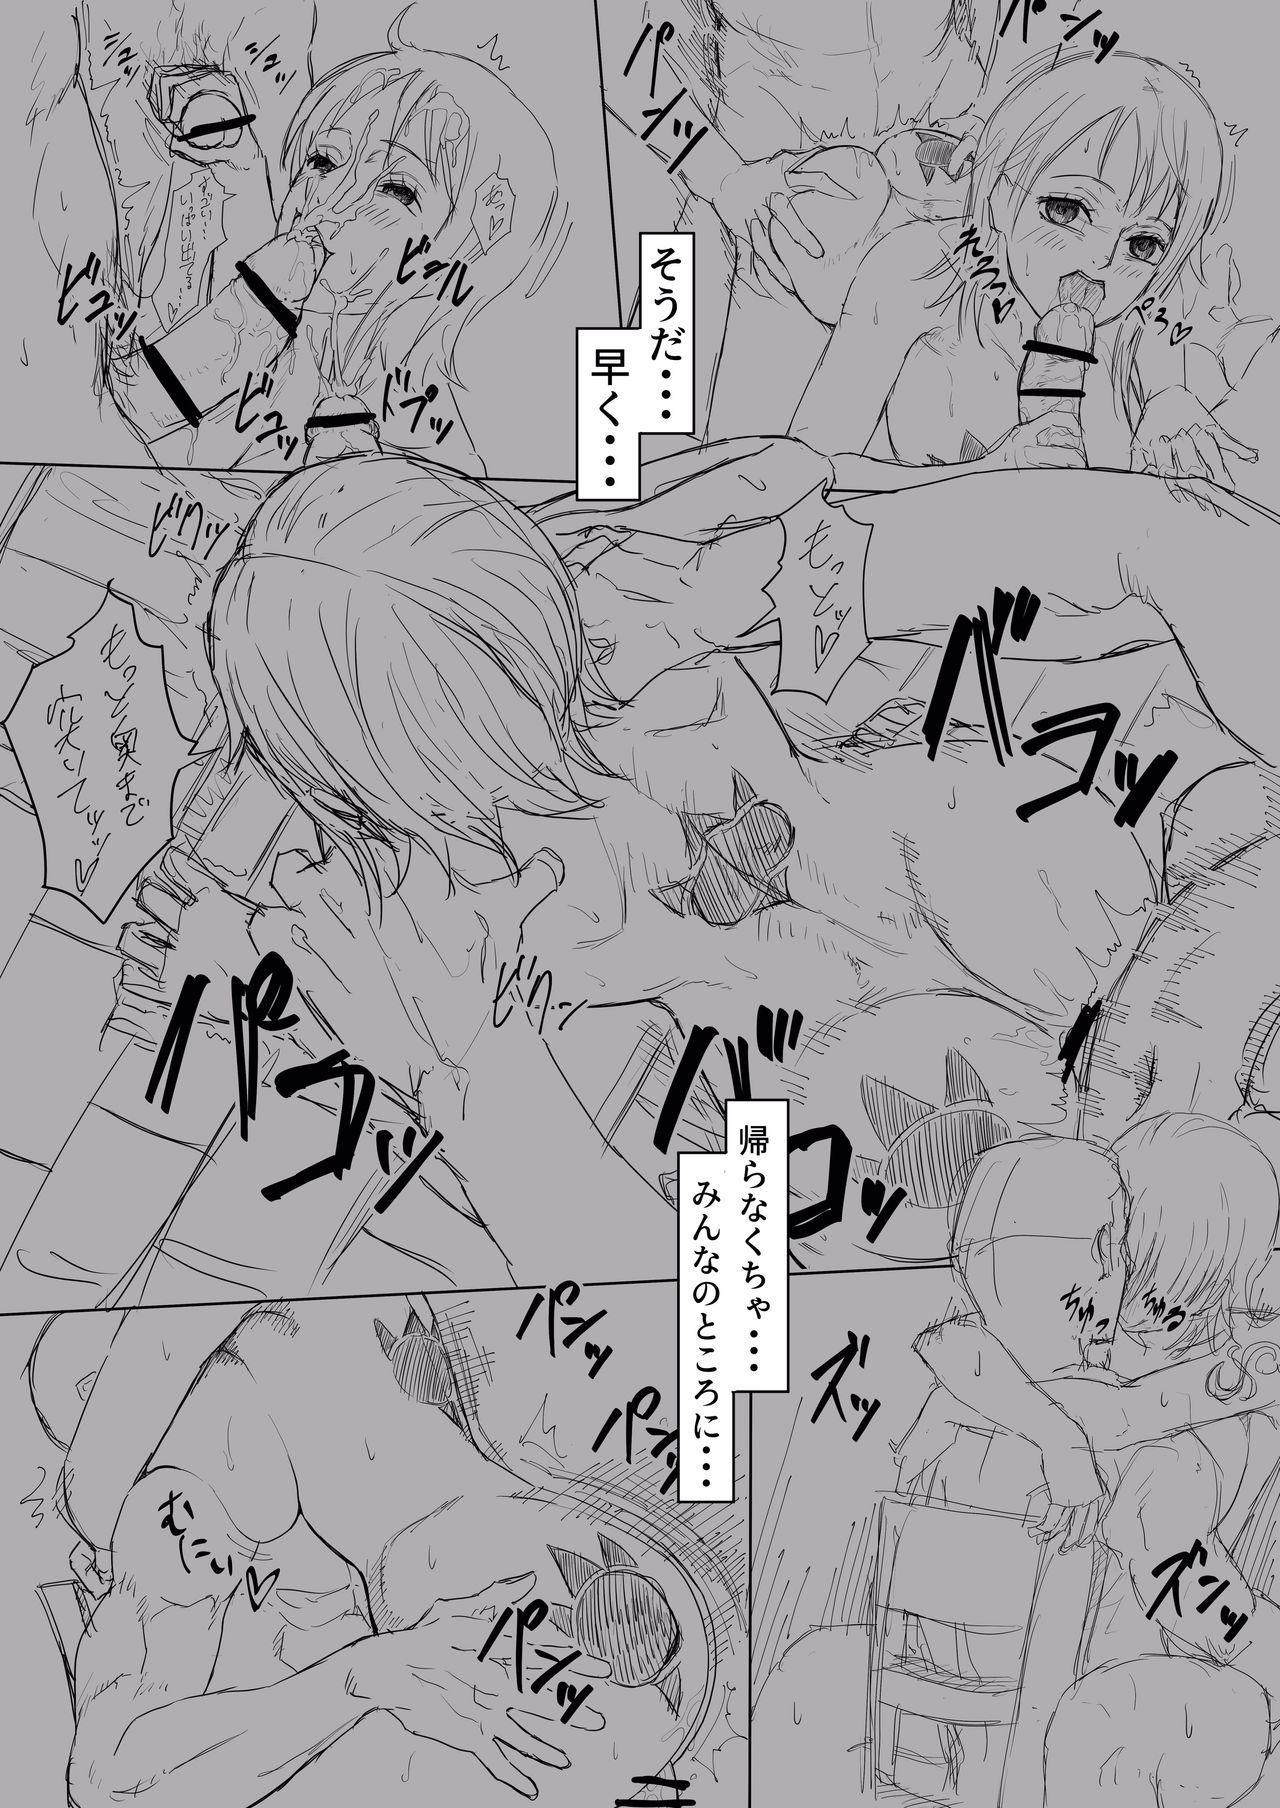 [Iwao] Nami H Manga (One Piece) Updated 13